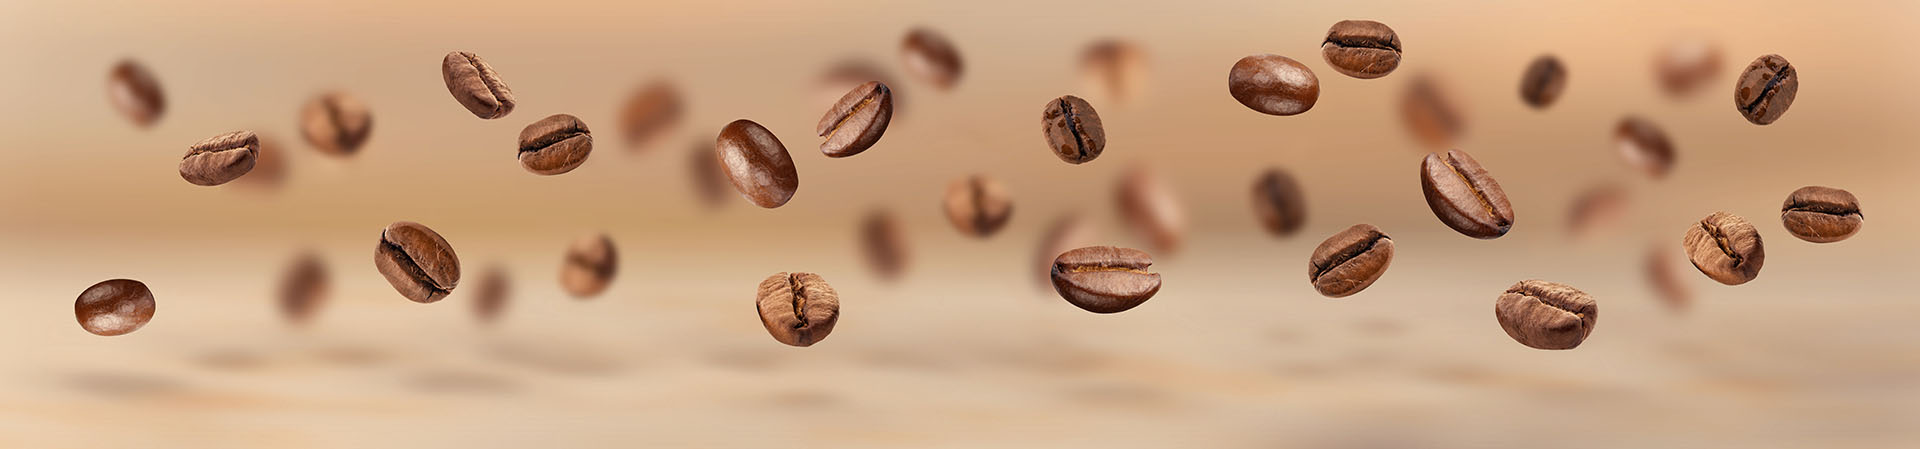 Flying coffee beans horizontal banner